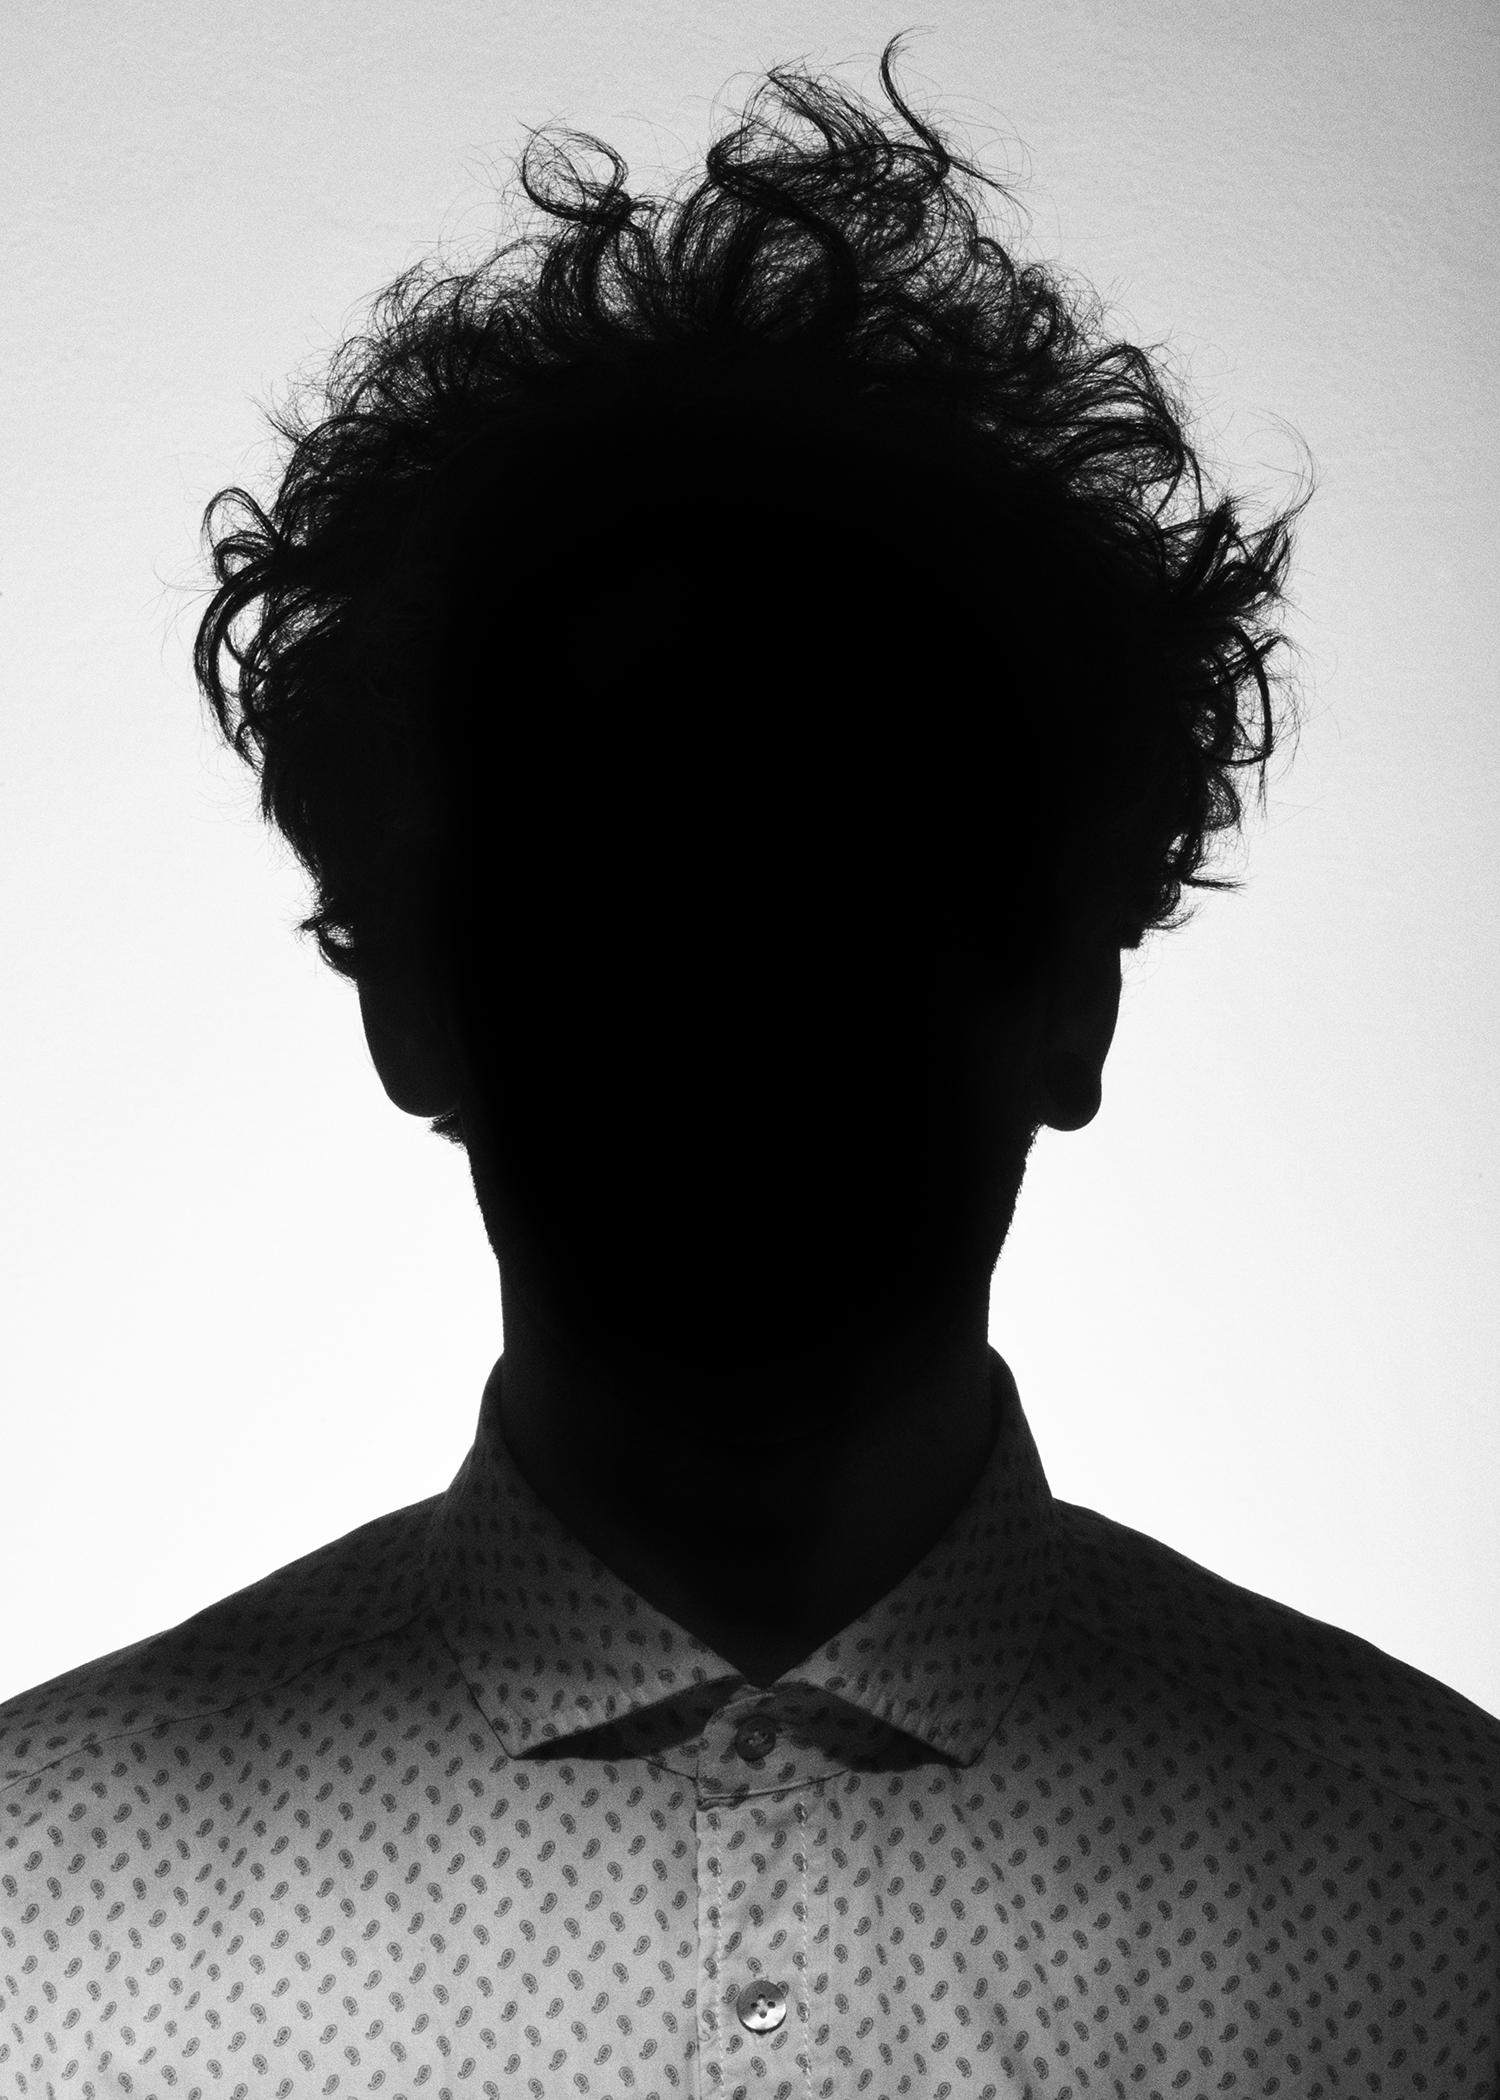 Rookley Debüt-EP Release